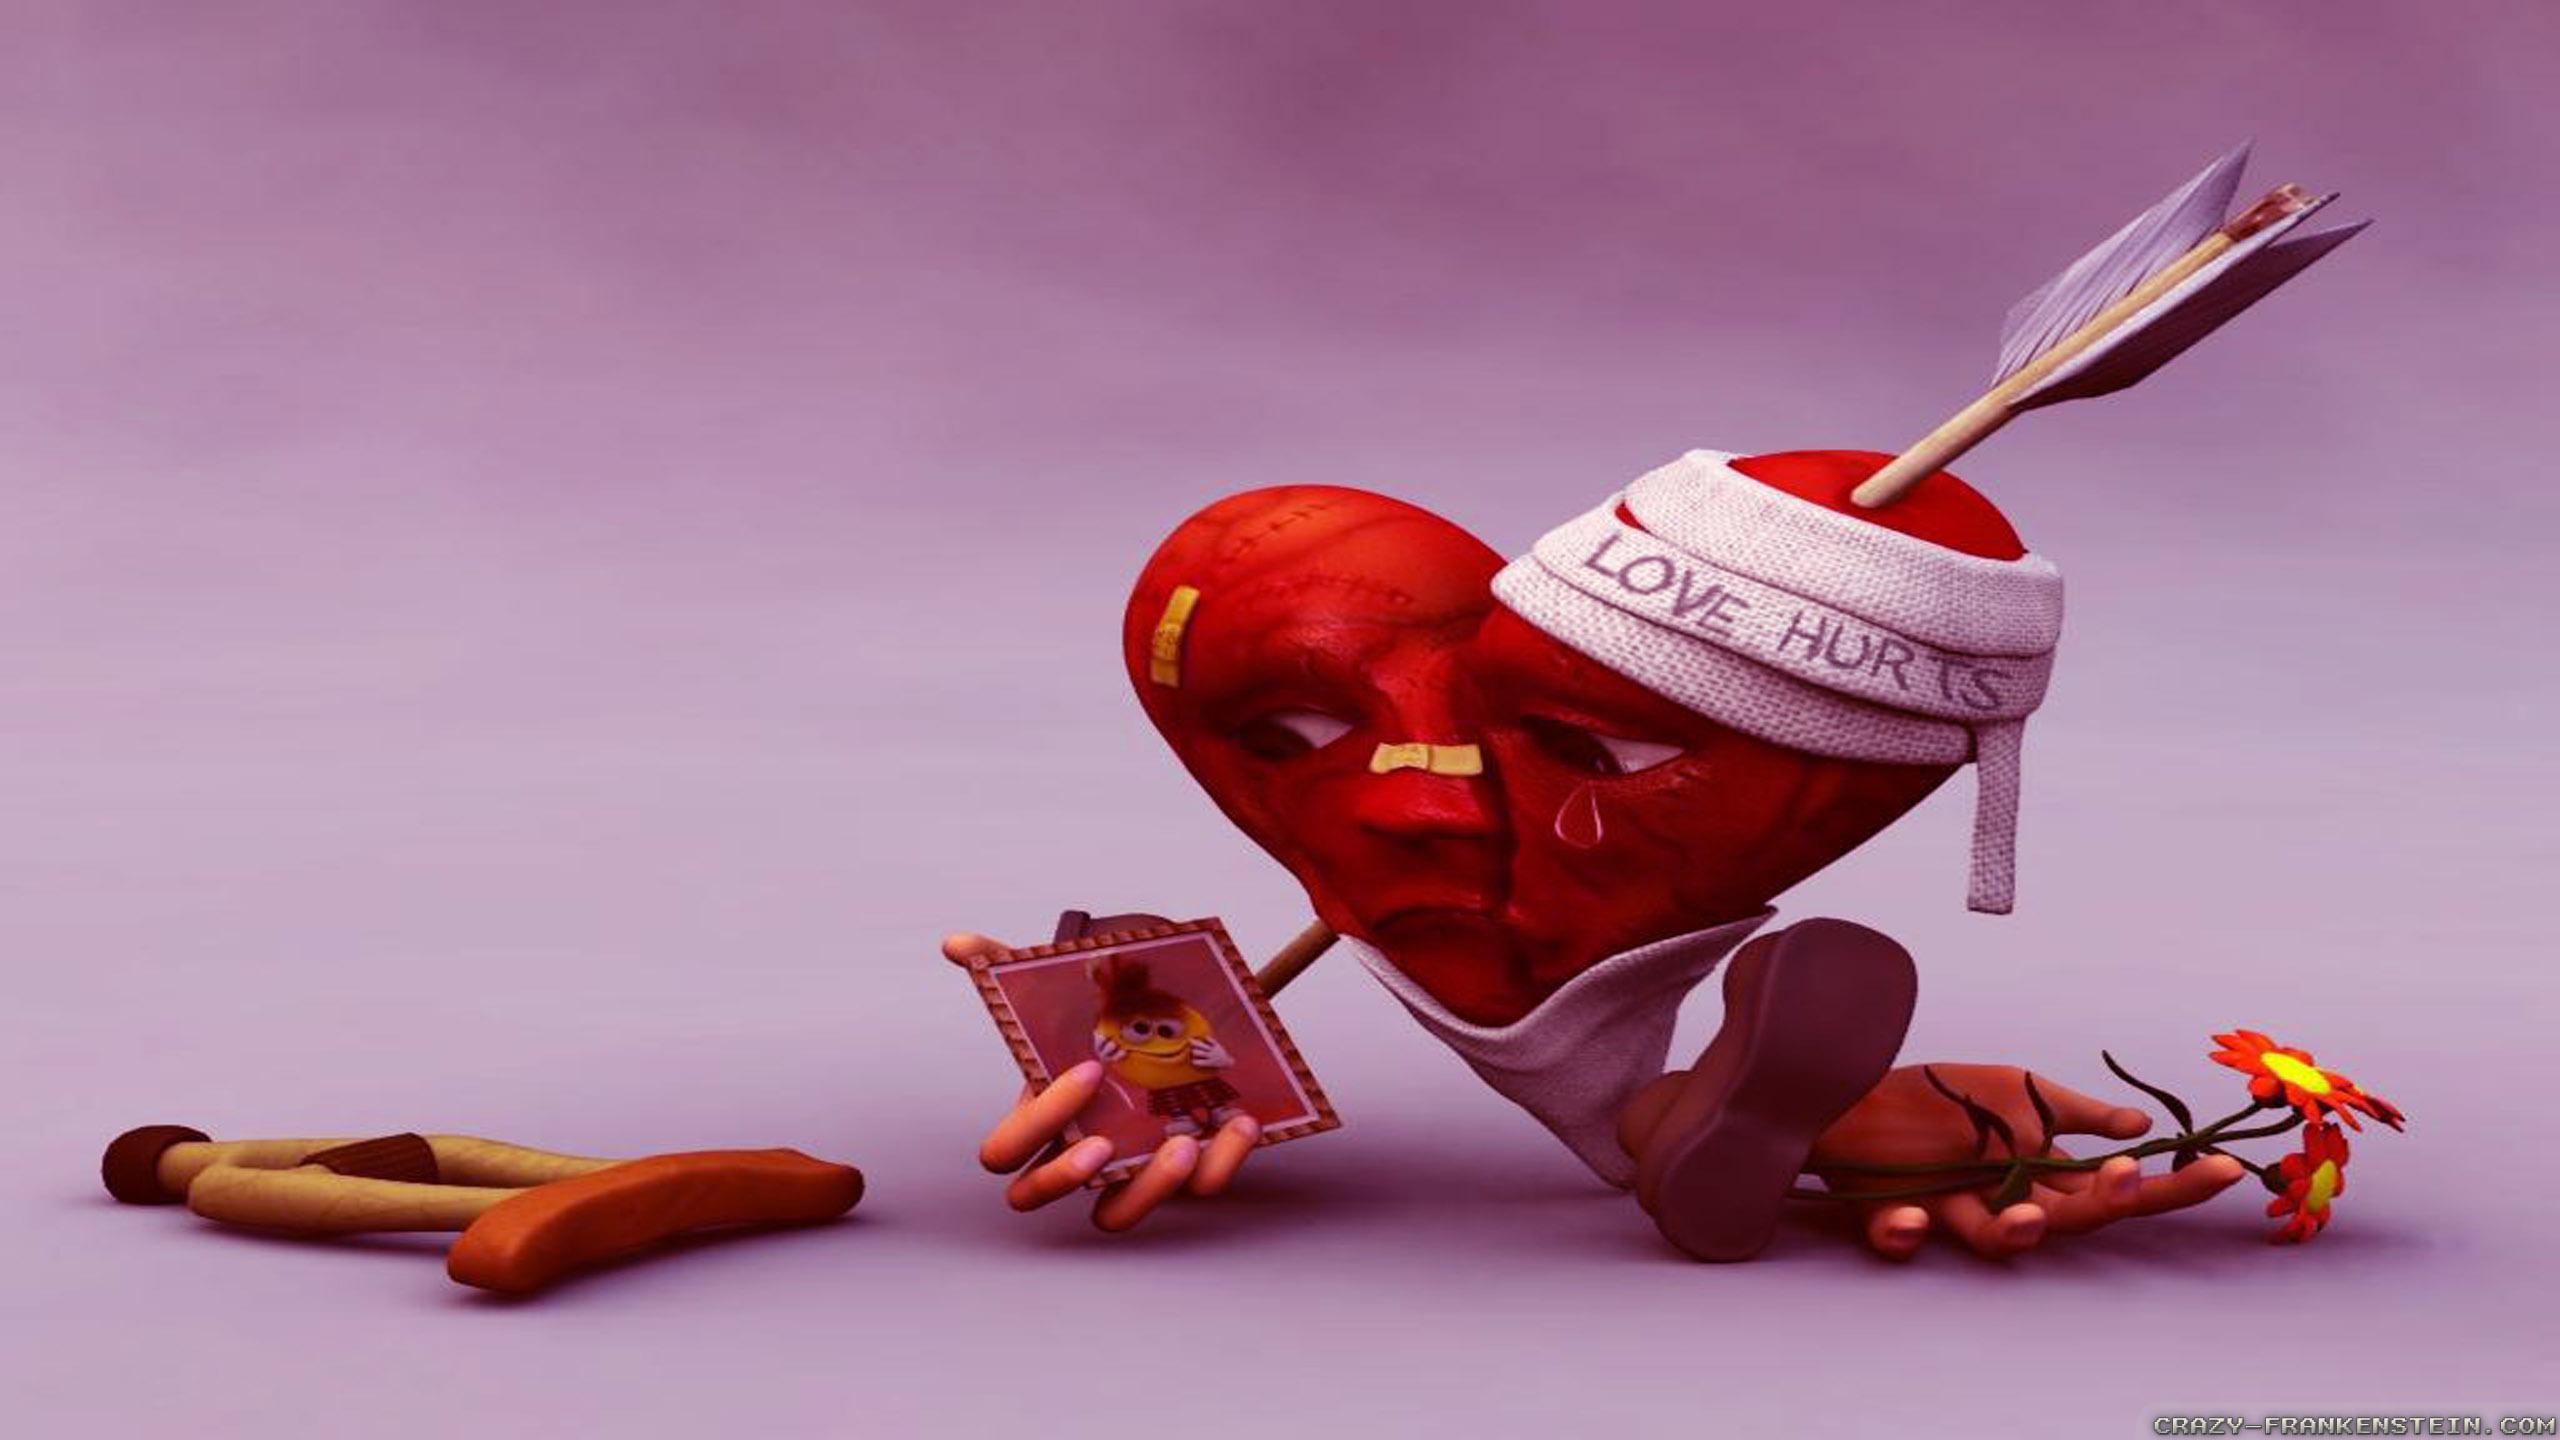 Wallpaper Love Is Pain - 2560x1440 ...